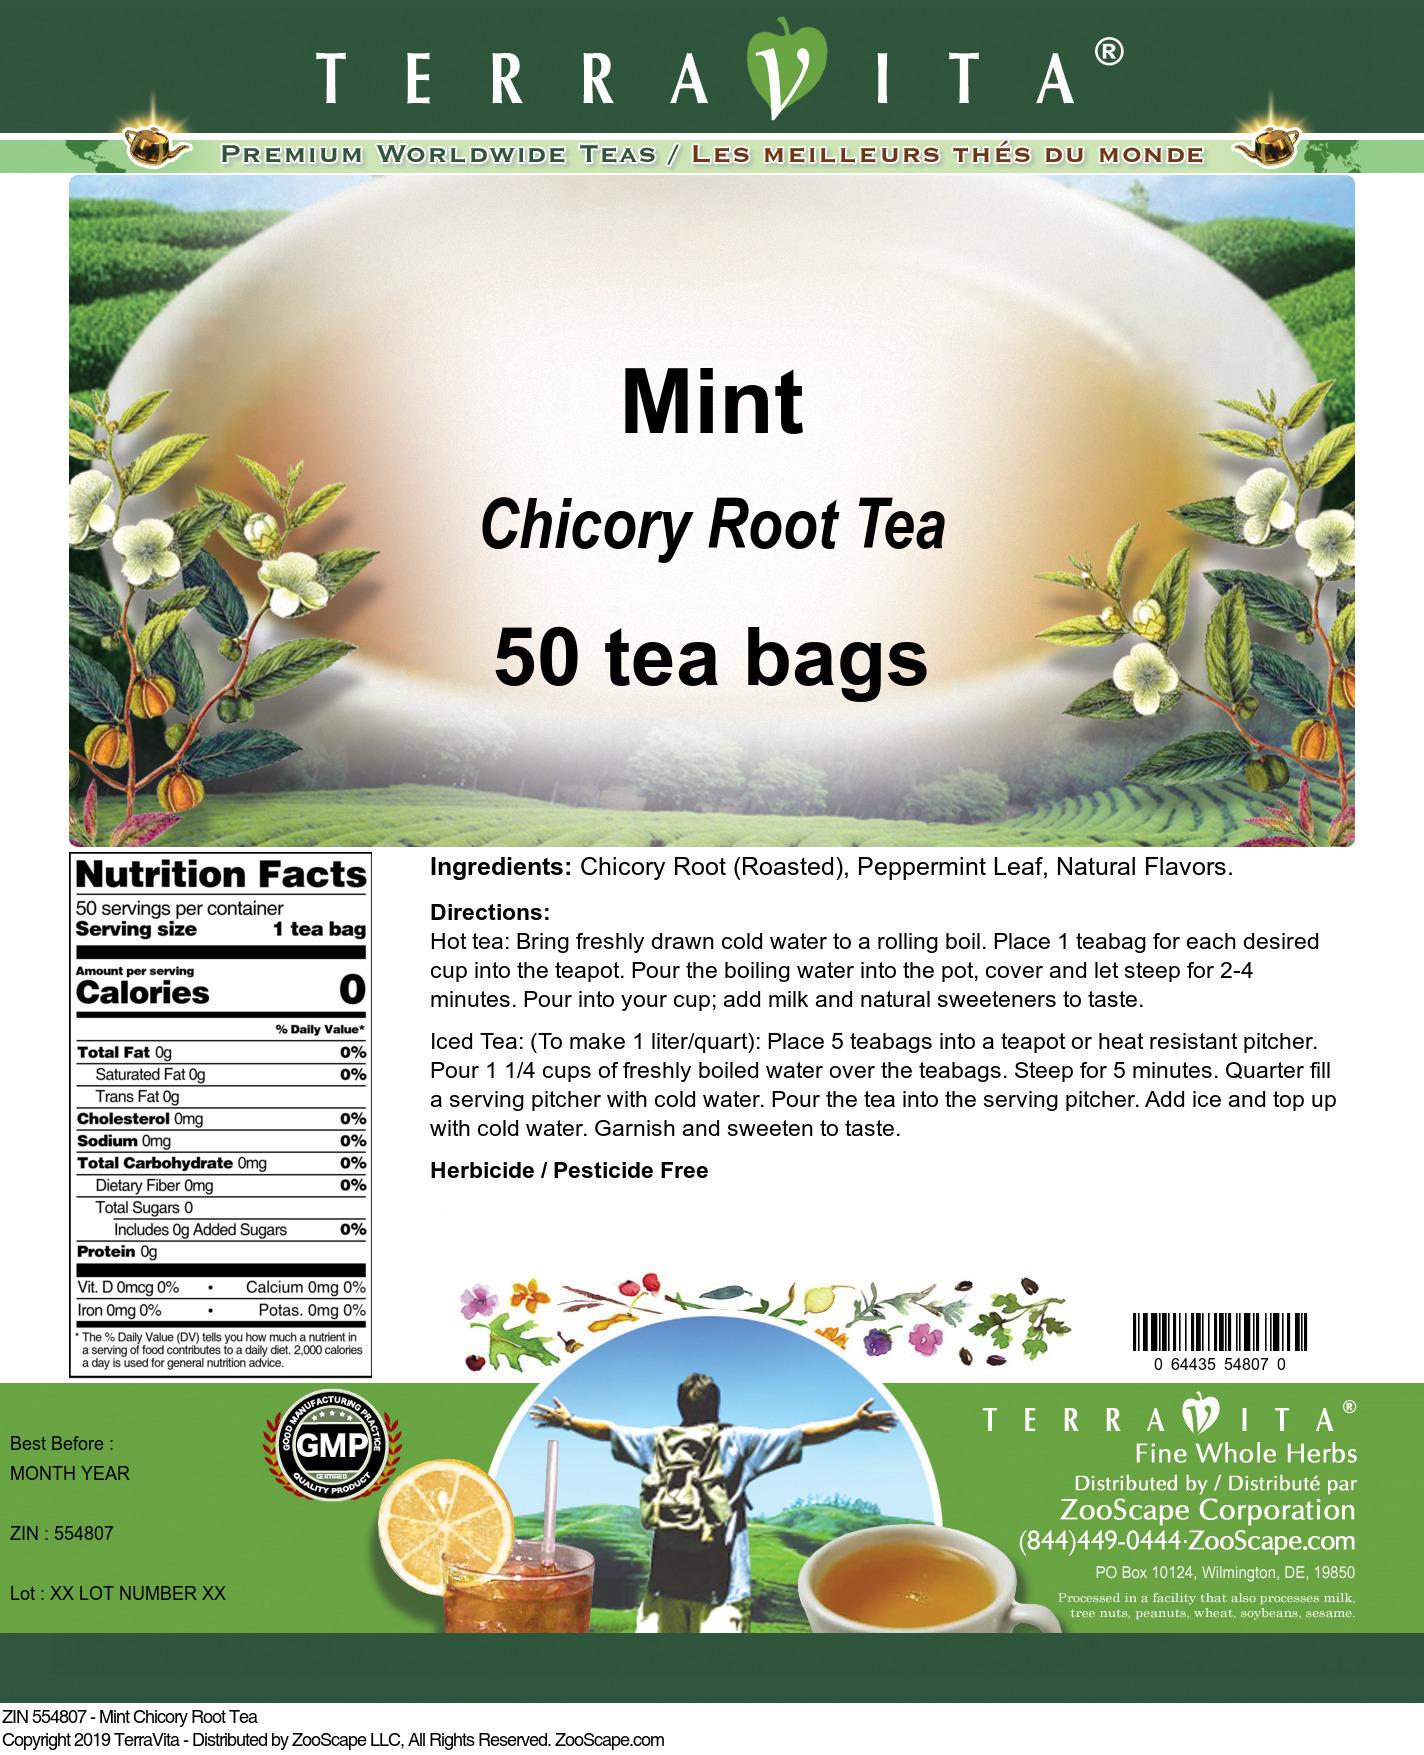 Mint Chicory Root Tea